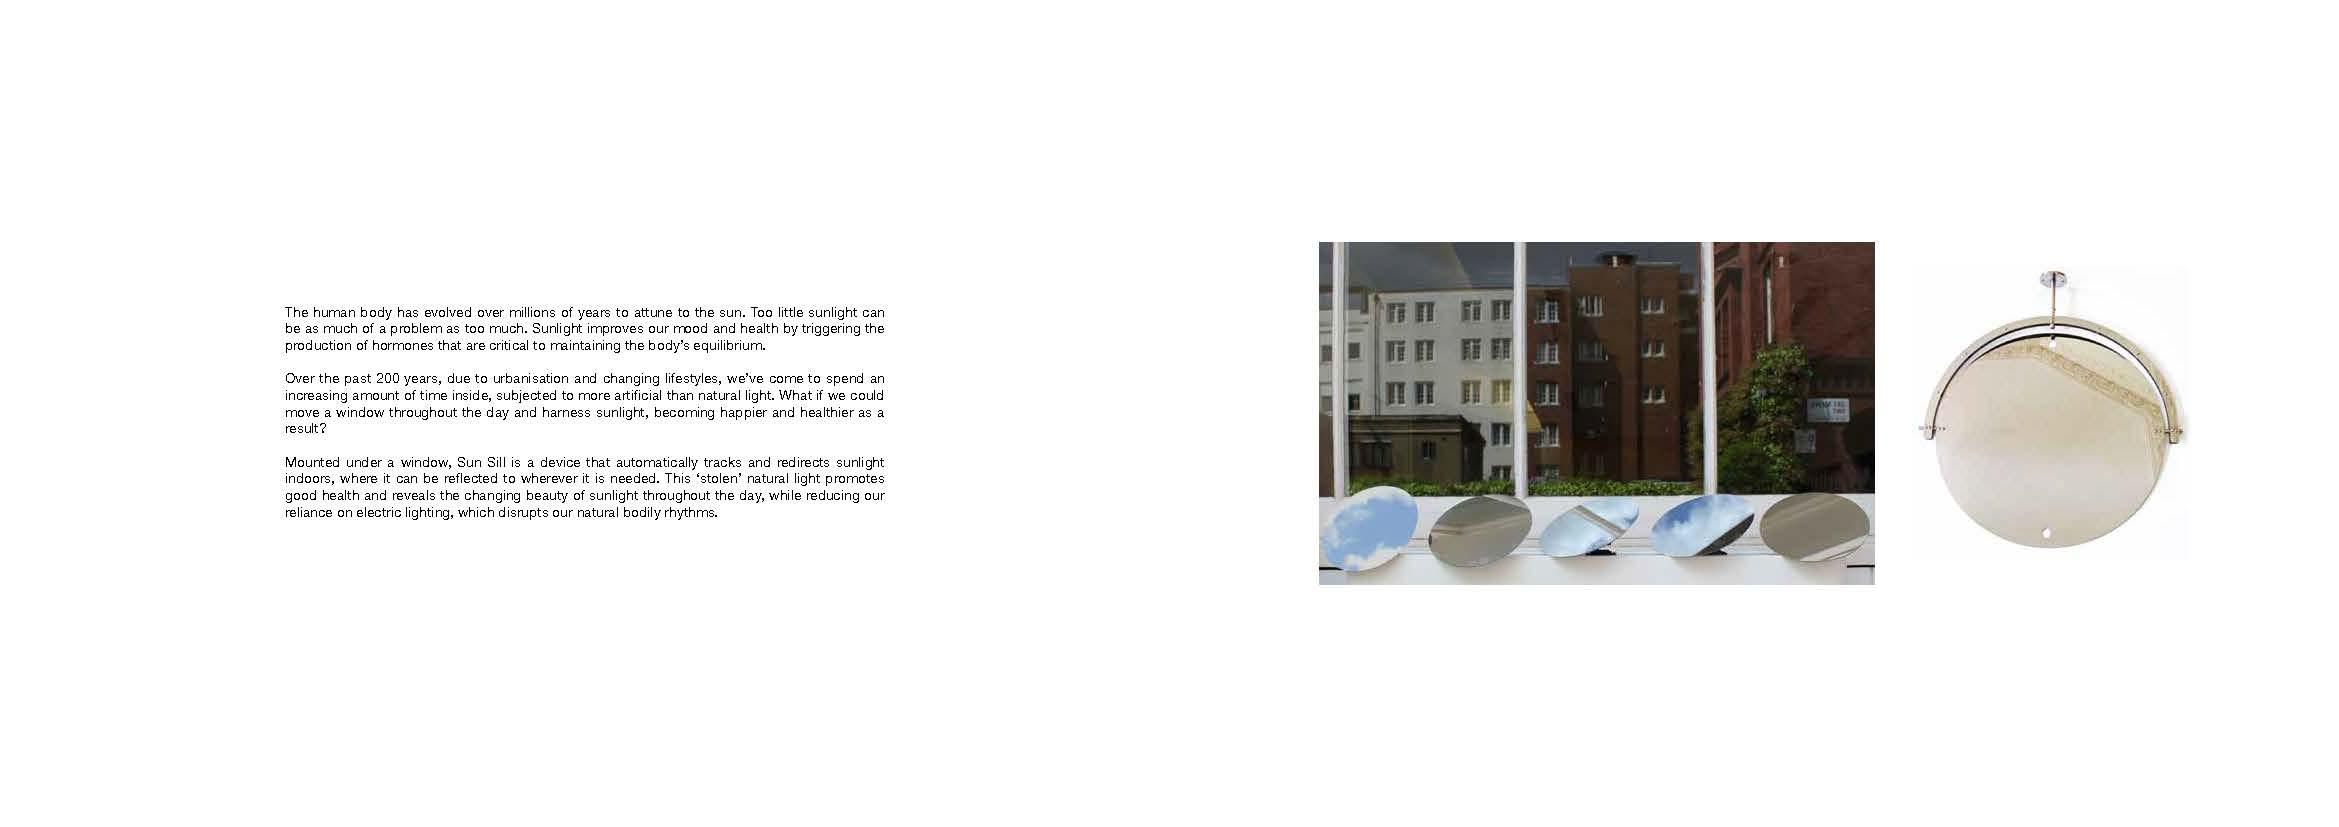 MANIFESTO MASTER FILE 221214 _Page_155.jpg